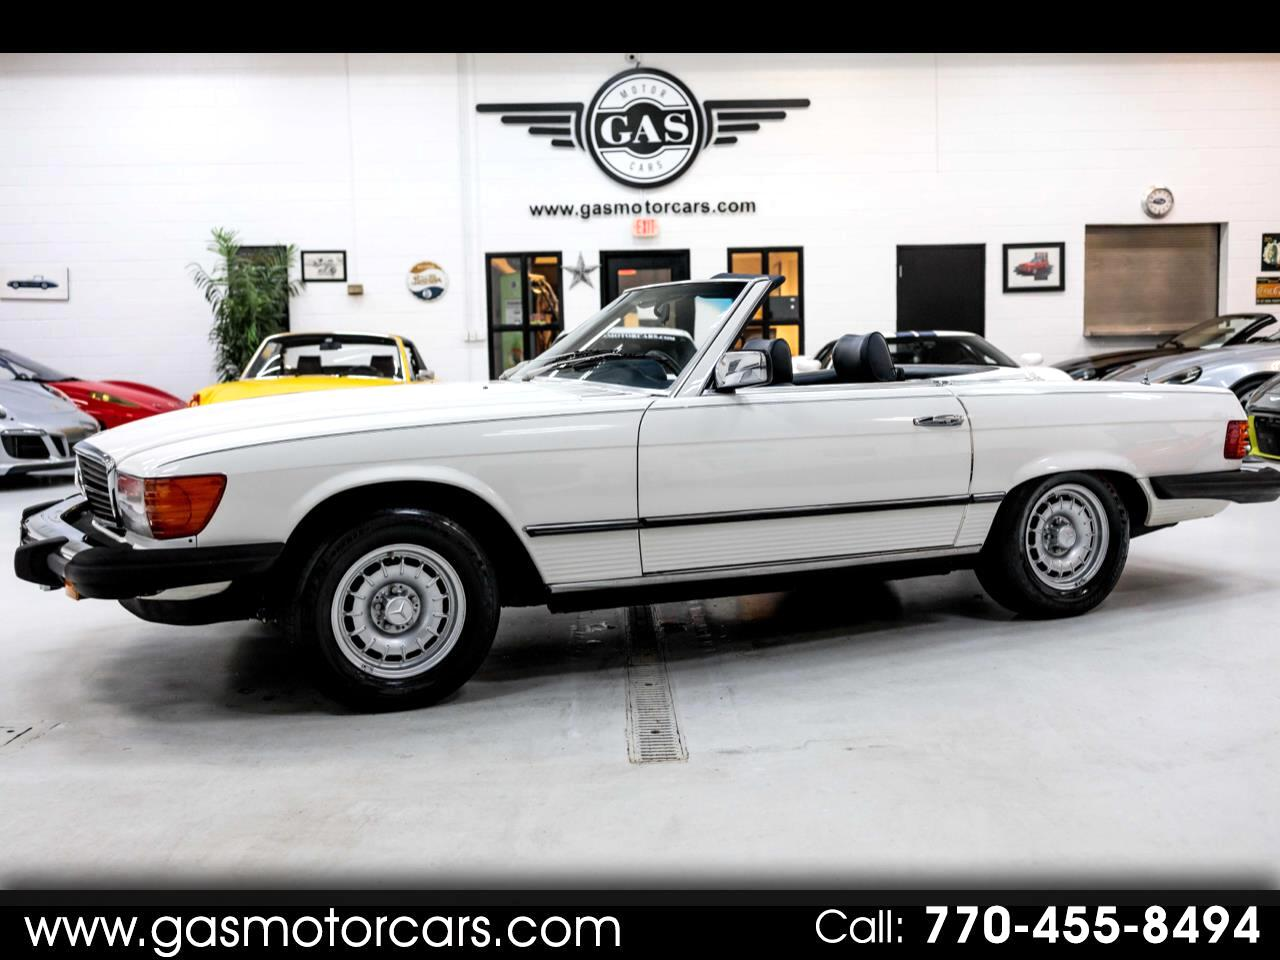 Mercedes-Benz 450 SL Convertible 1980